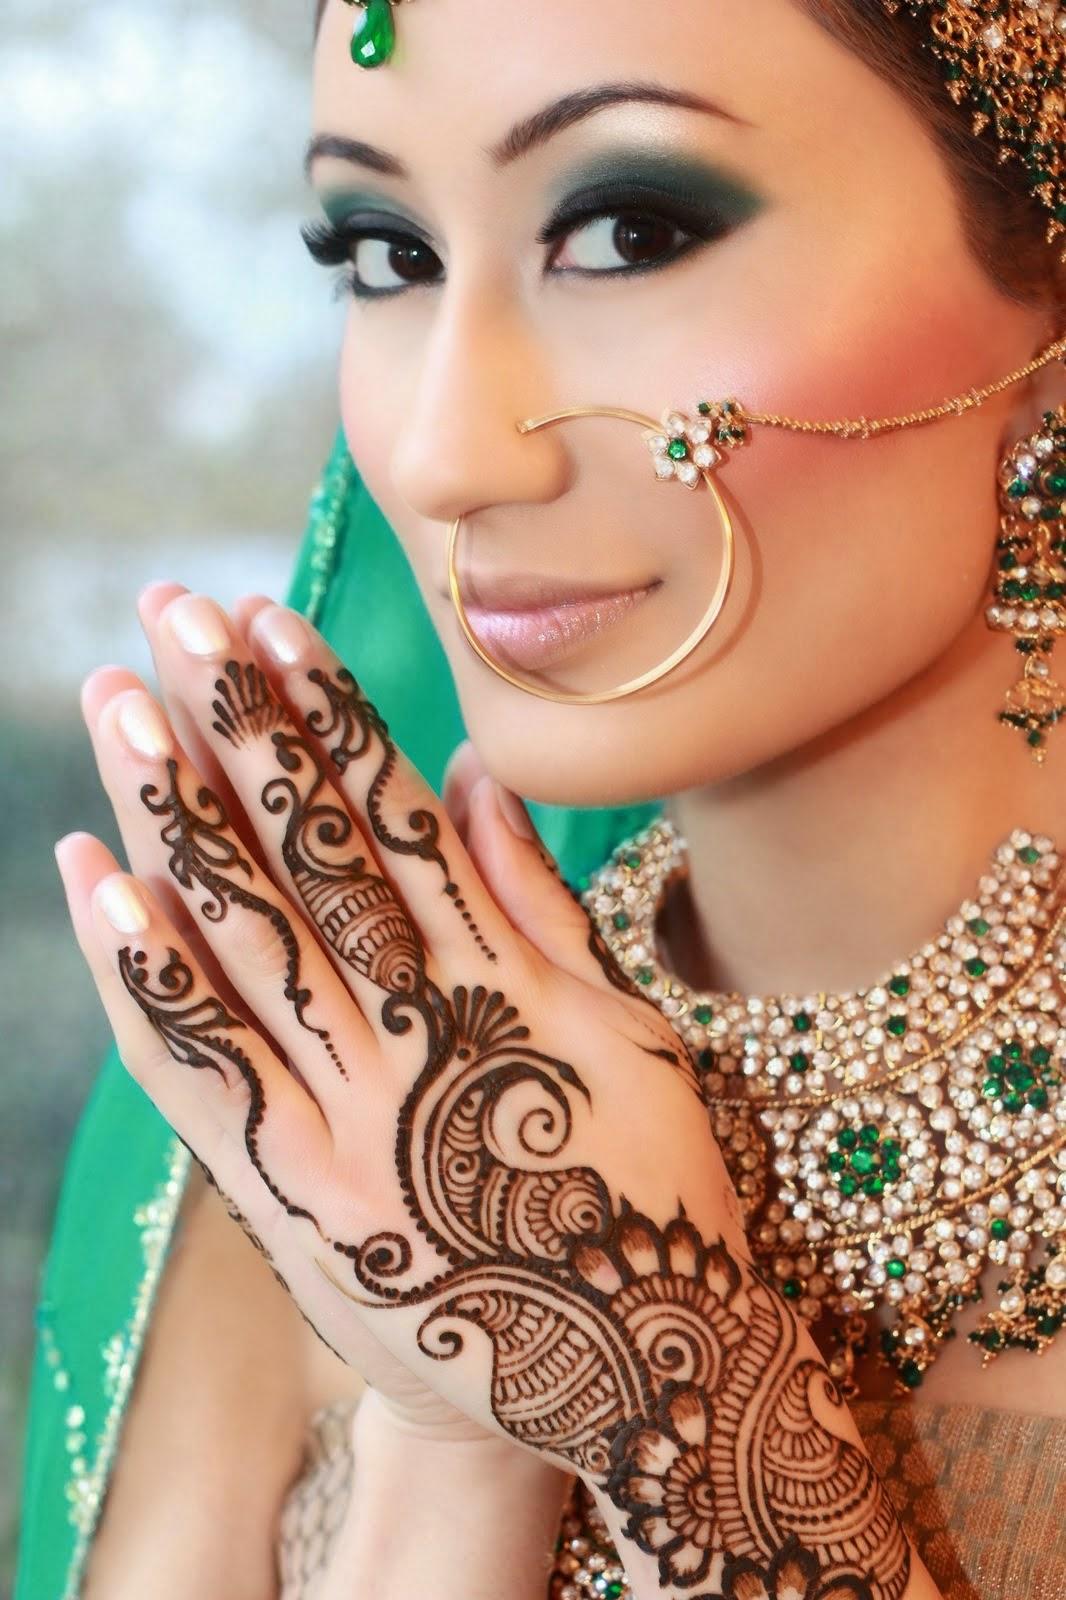 Urdu Blogs All About Urdu Posts Wallpaper Indian Bridle Makeup